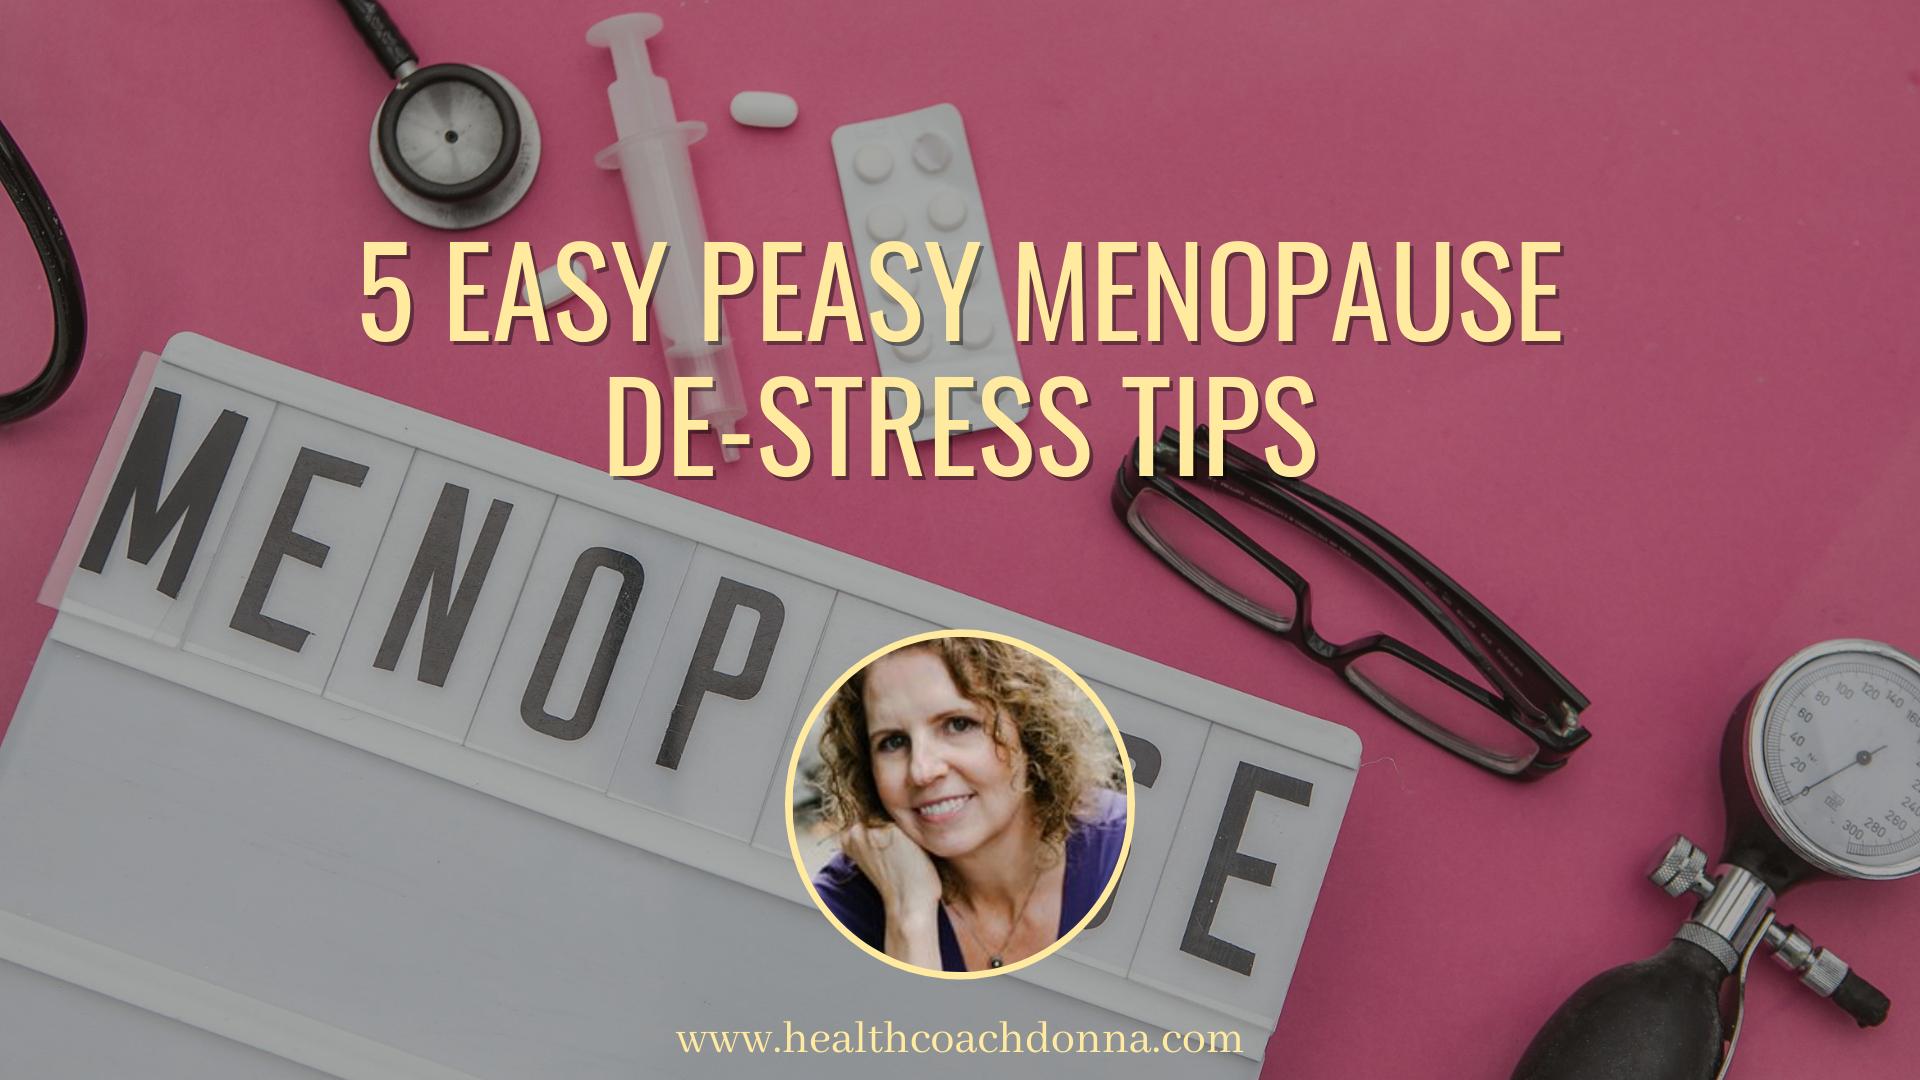 5 Easy Peasy Menopause De-Stress Tips